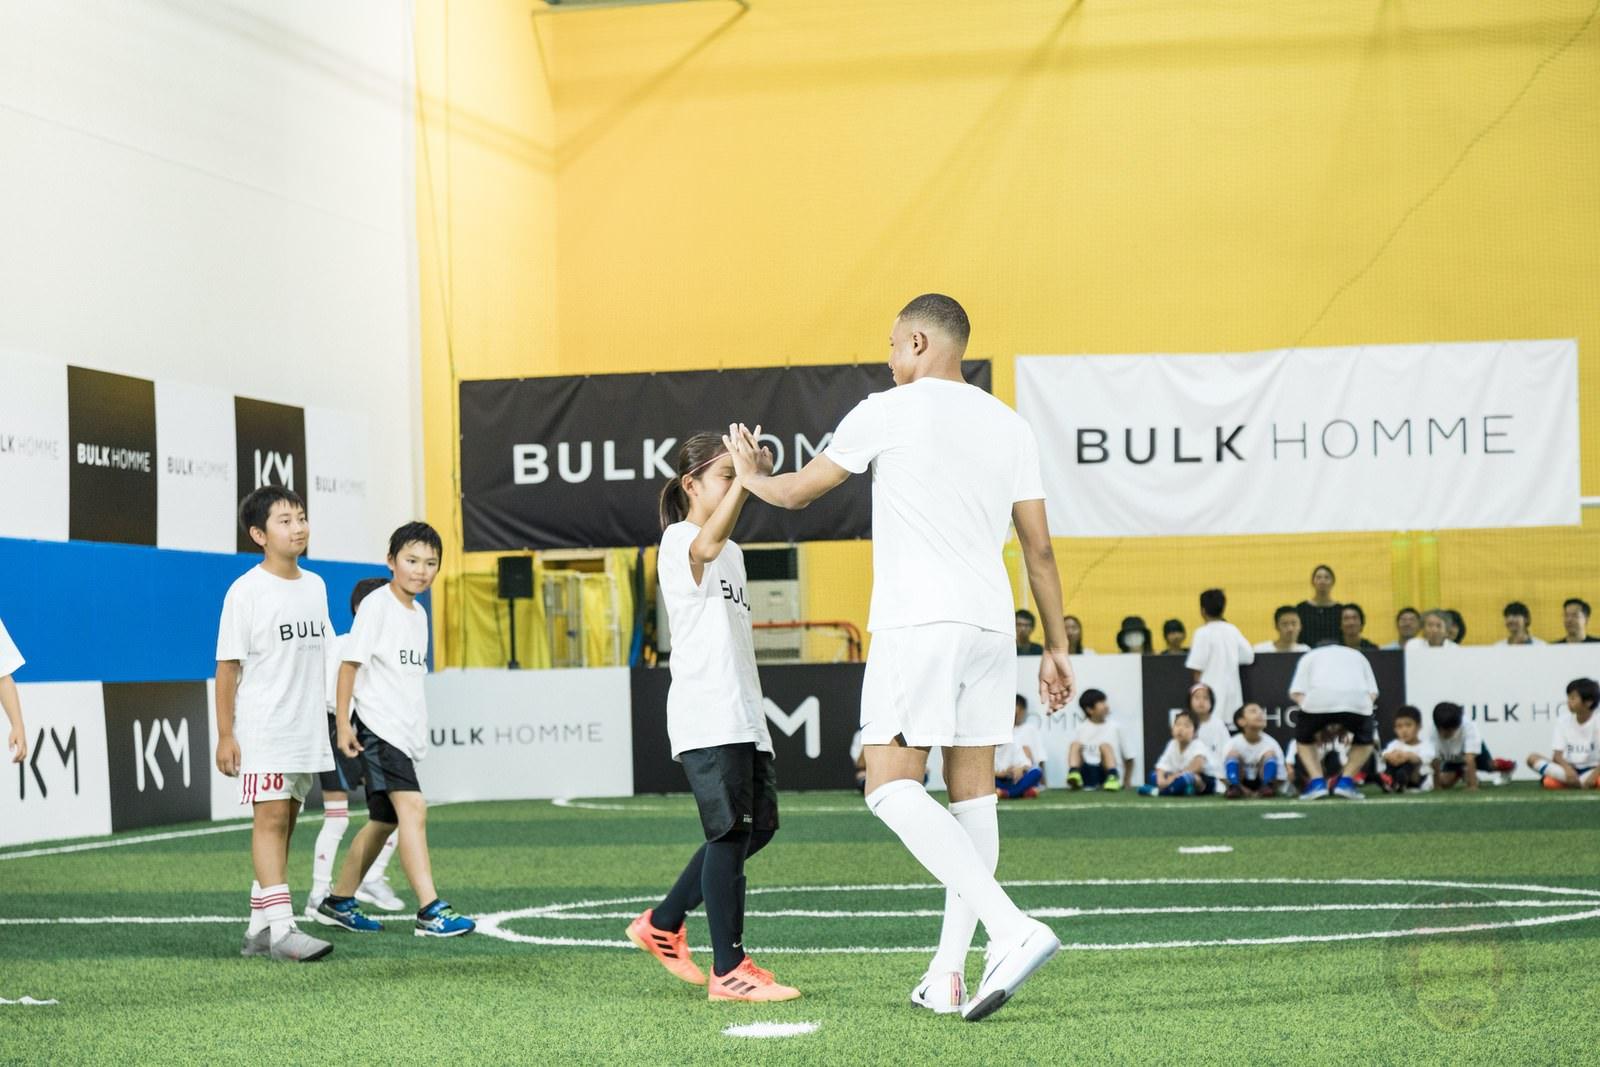 Kylian Mbappé plays soccer with kids 12